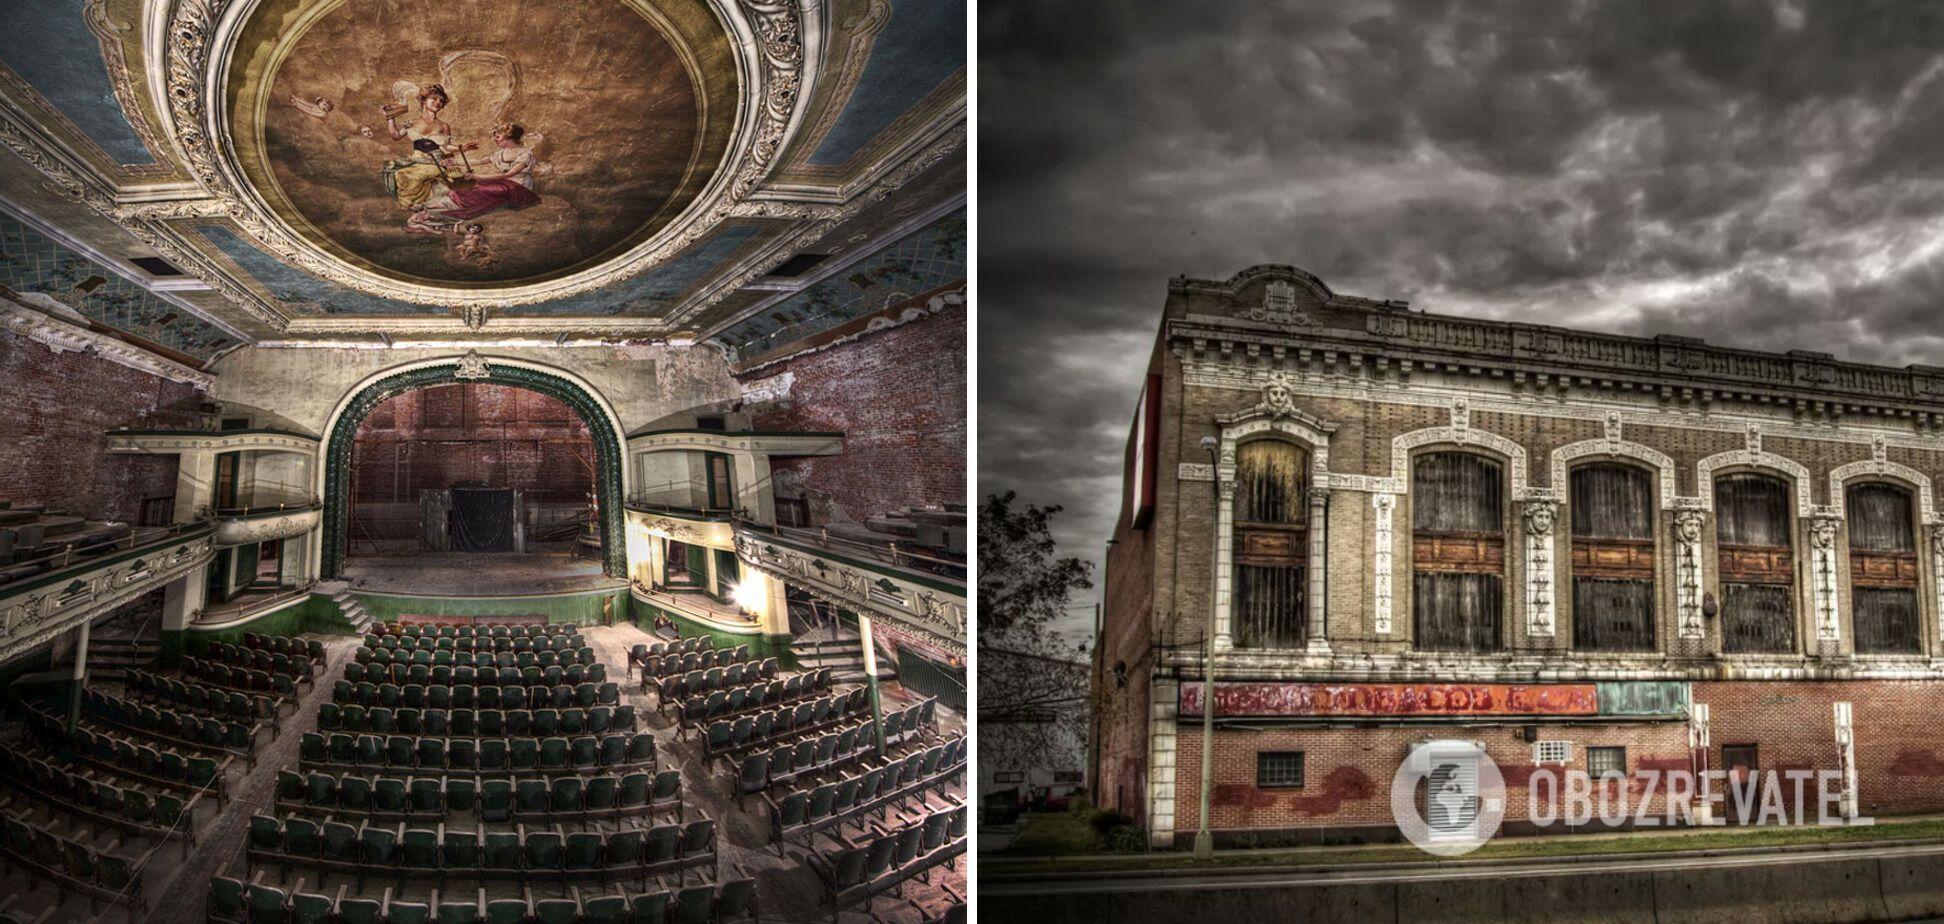 В старом театре в штате Массачусетс продавали табак